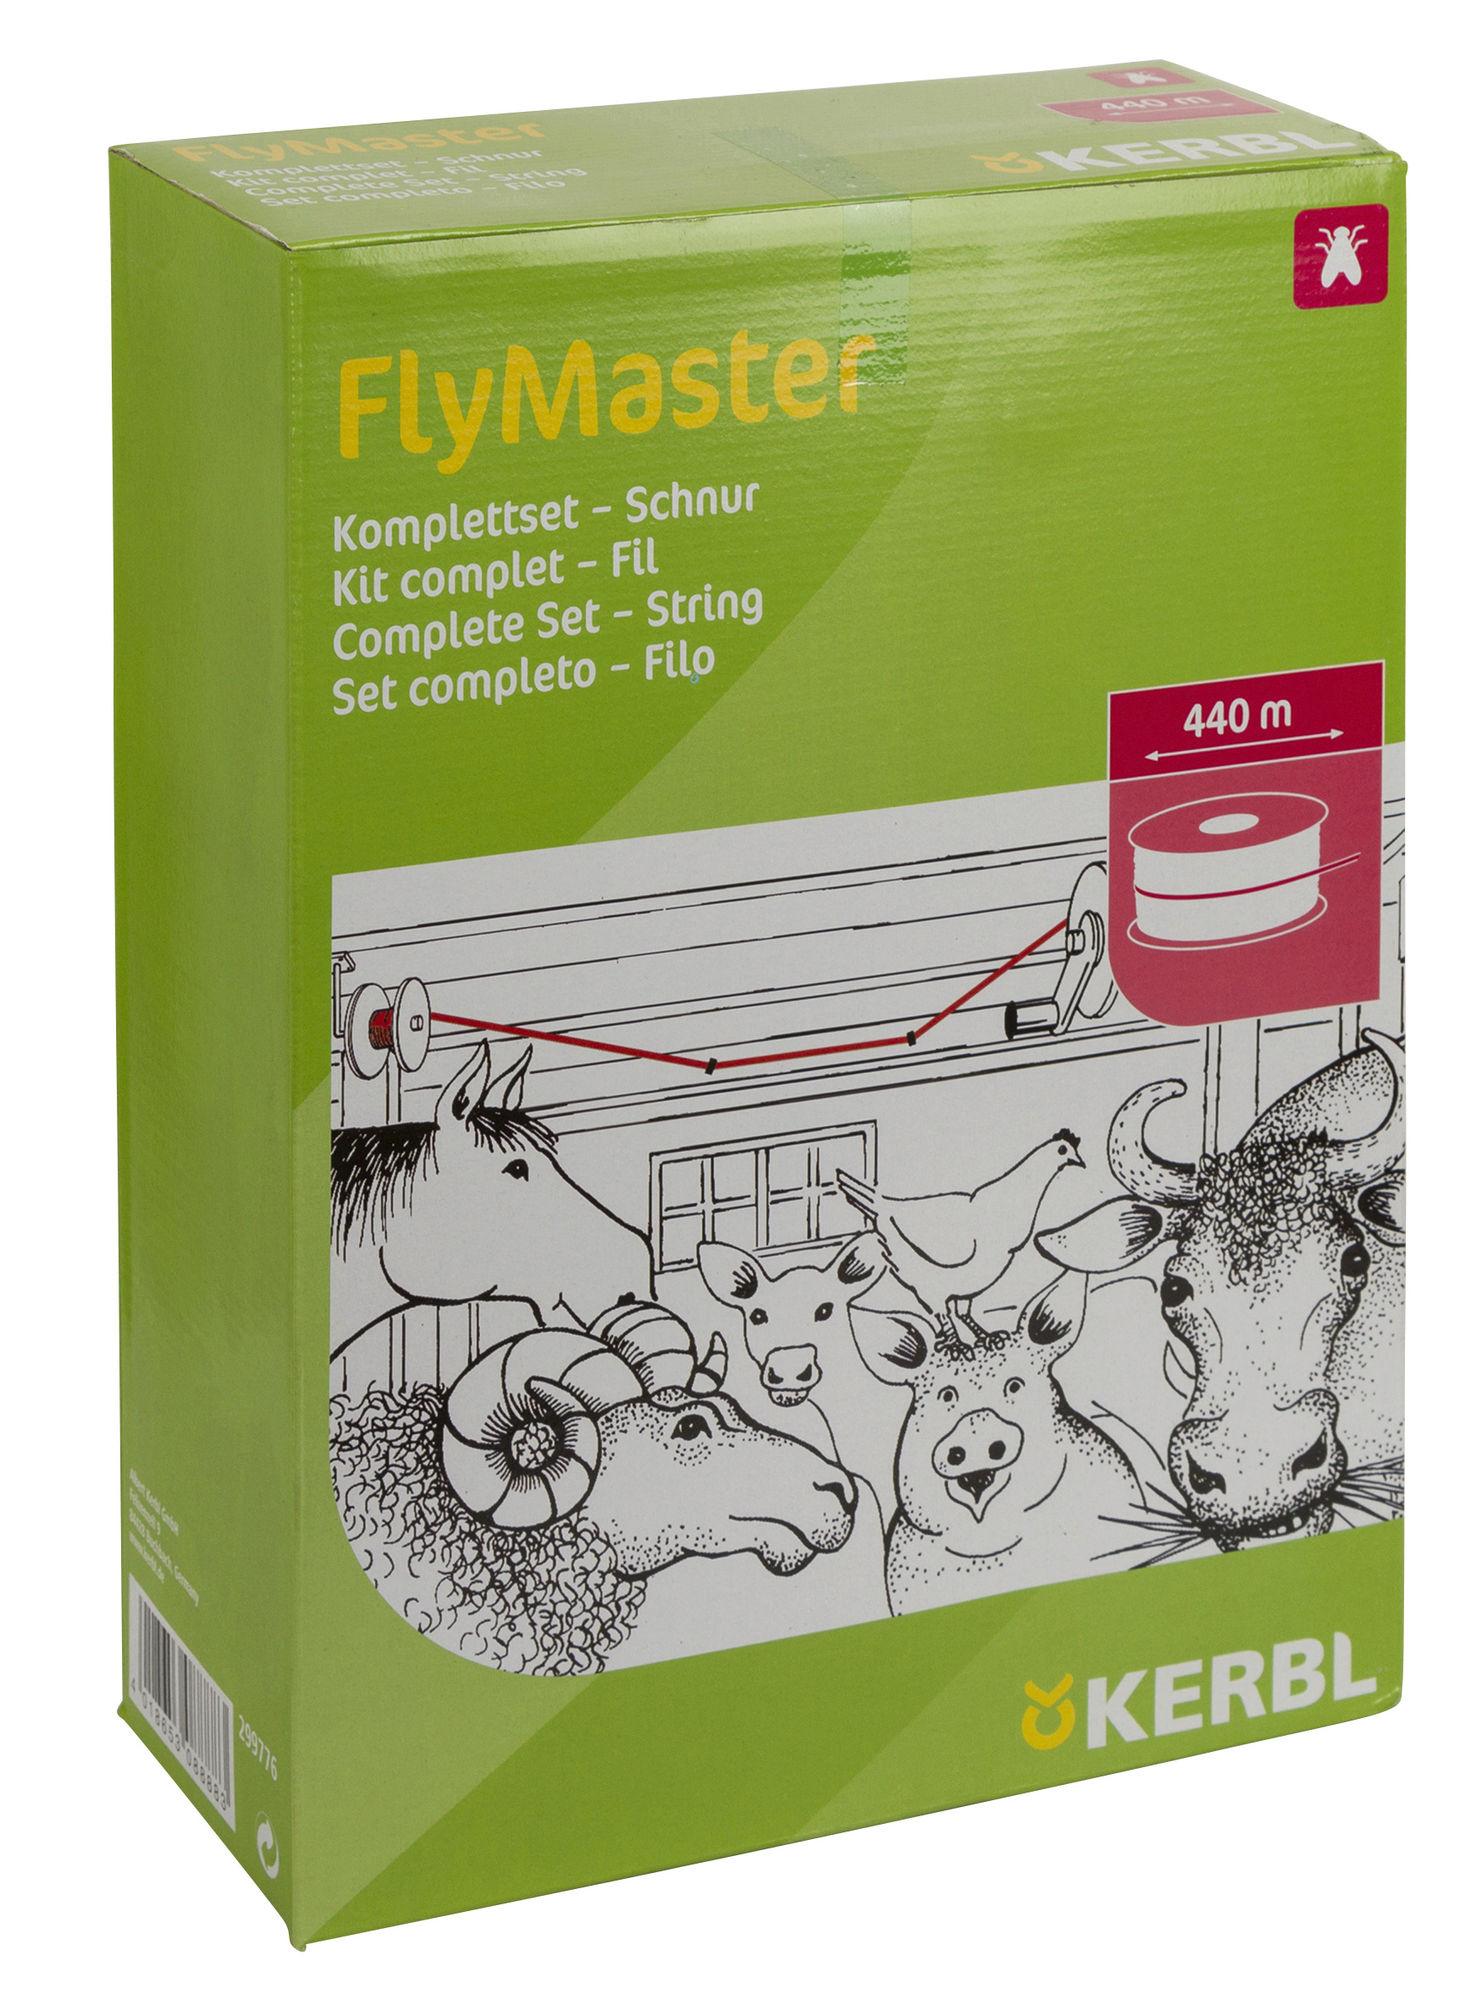 FlyMaster Fliegenschnur Komplettset 440mtr.